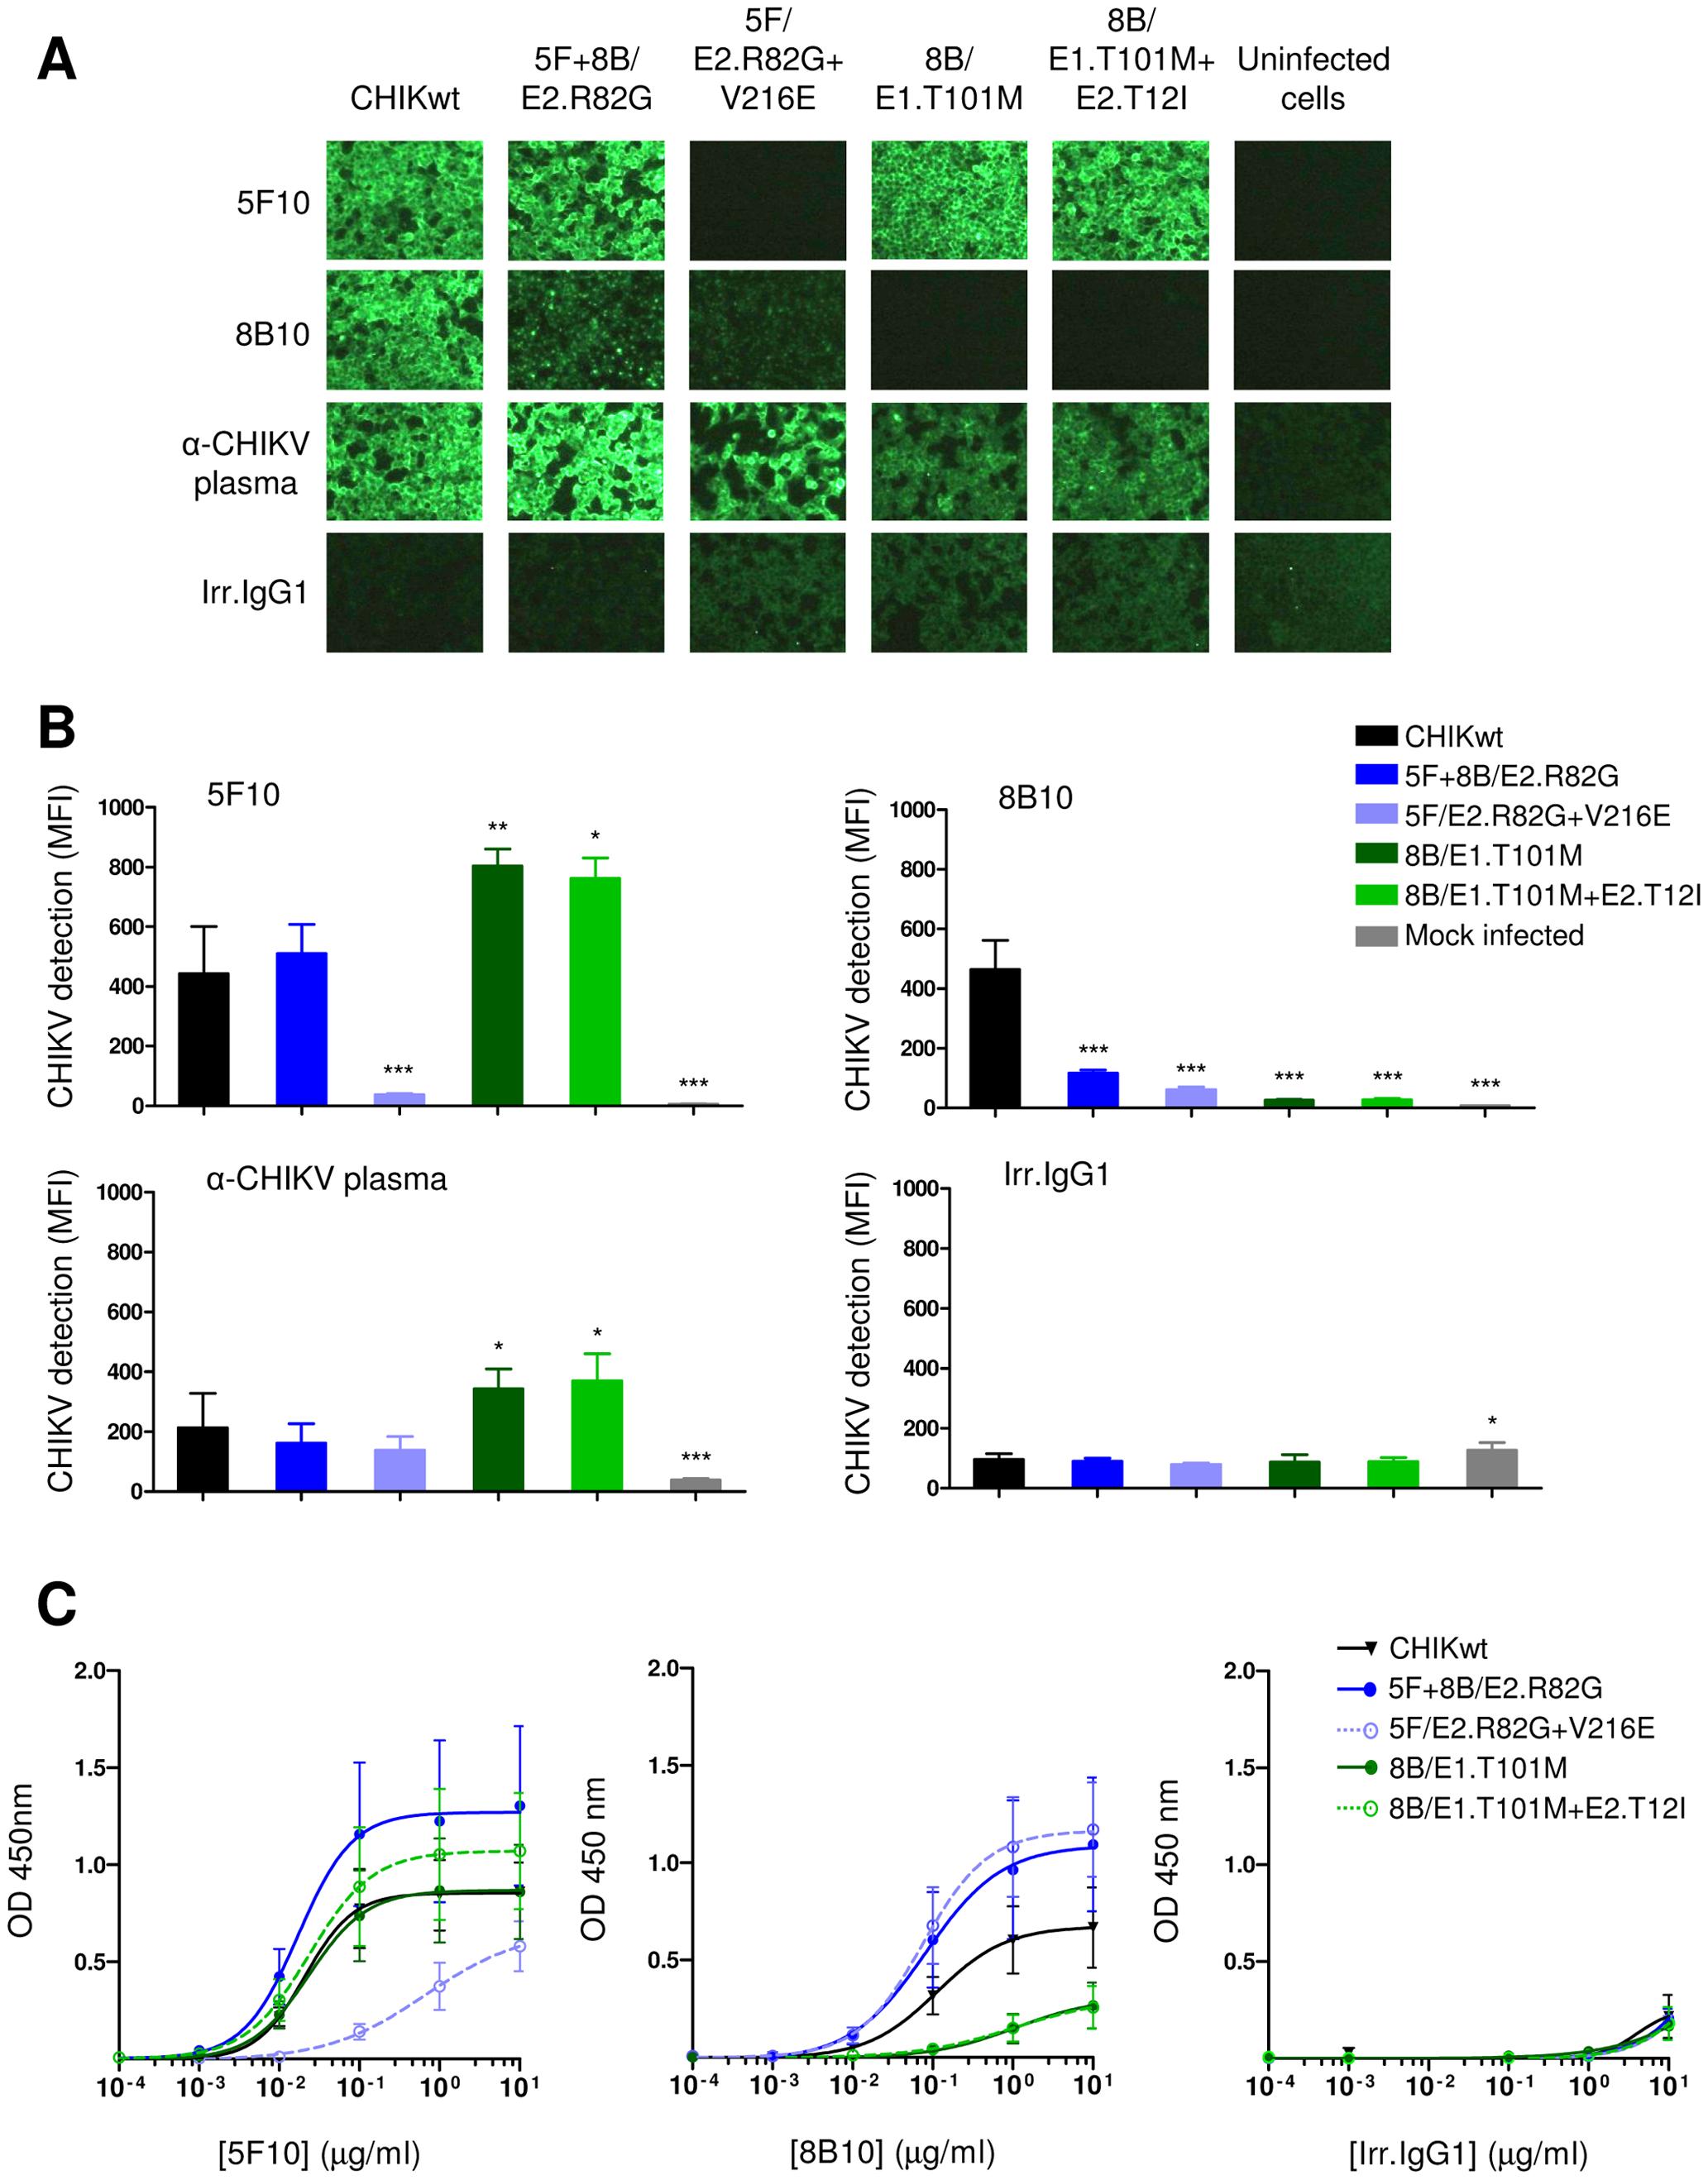 Analysis of 5F10 and 8B10 mAb binding to clonal CHIKVs.